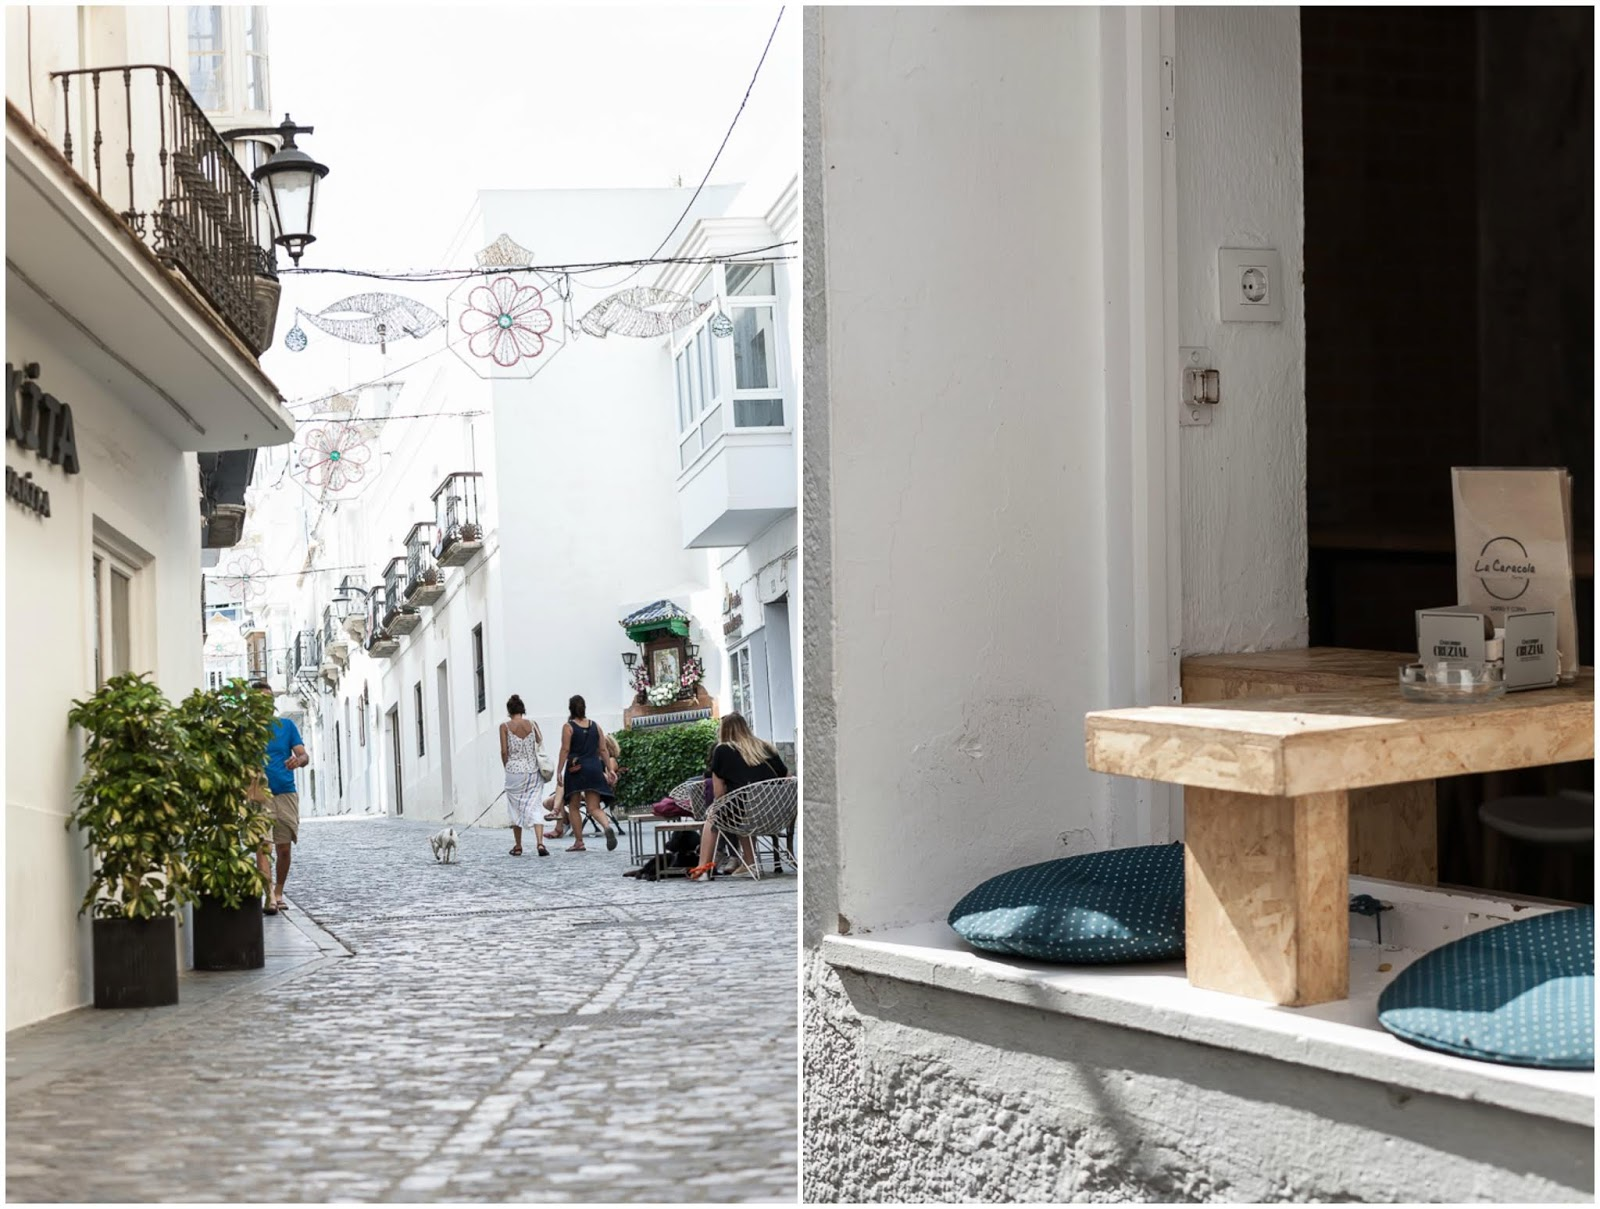 streets of Tarifa